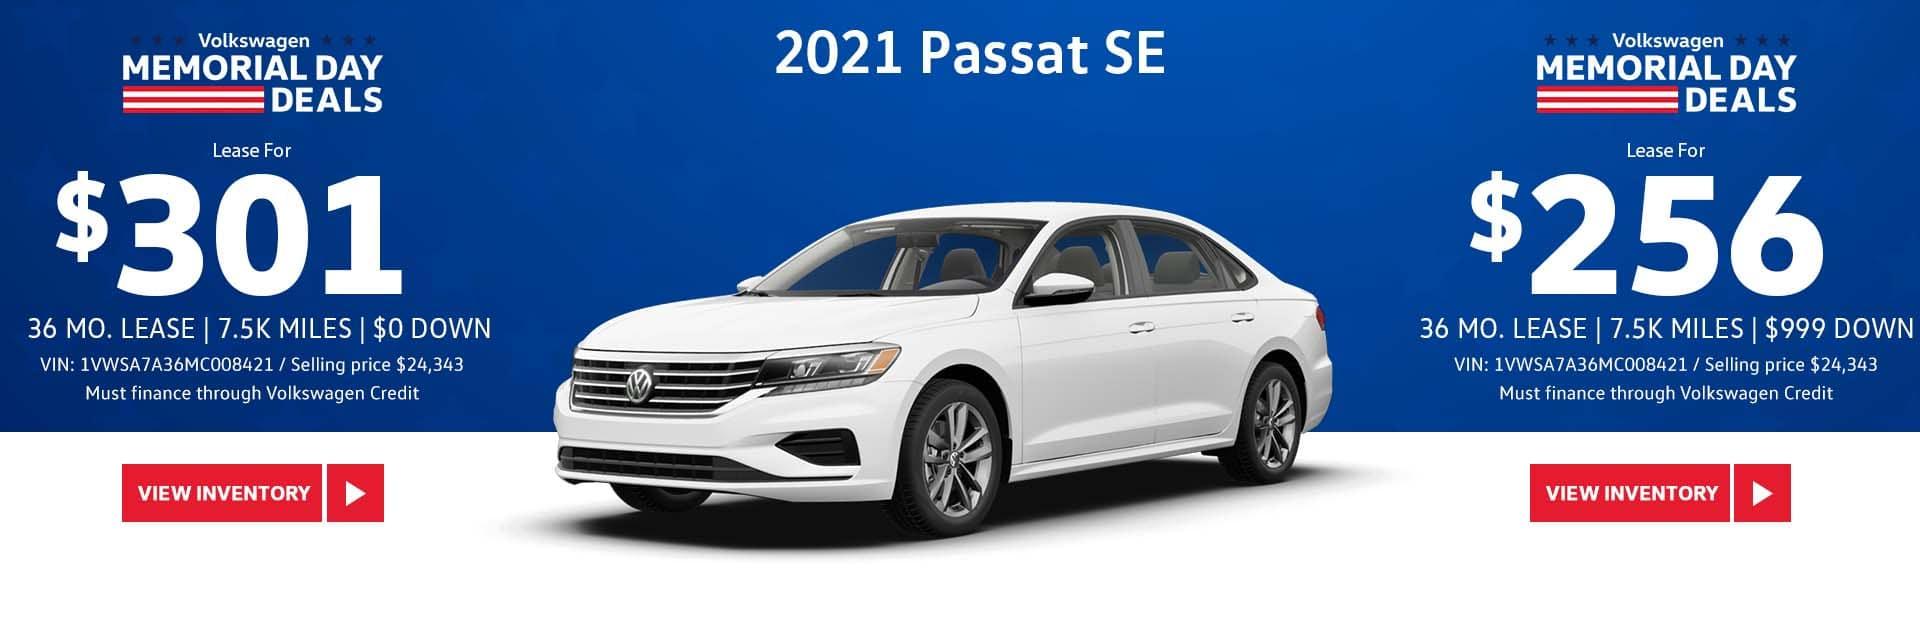 May Passat SE Lease Offer Slide-Update